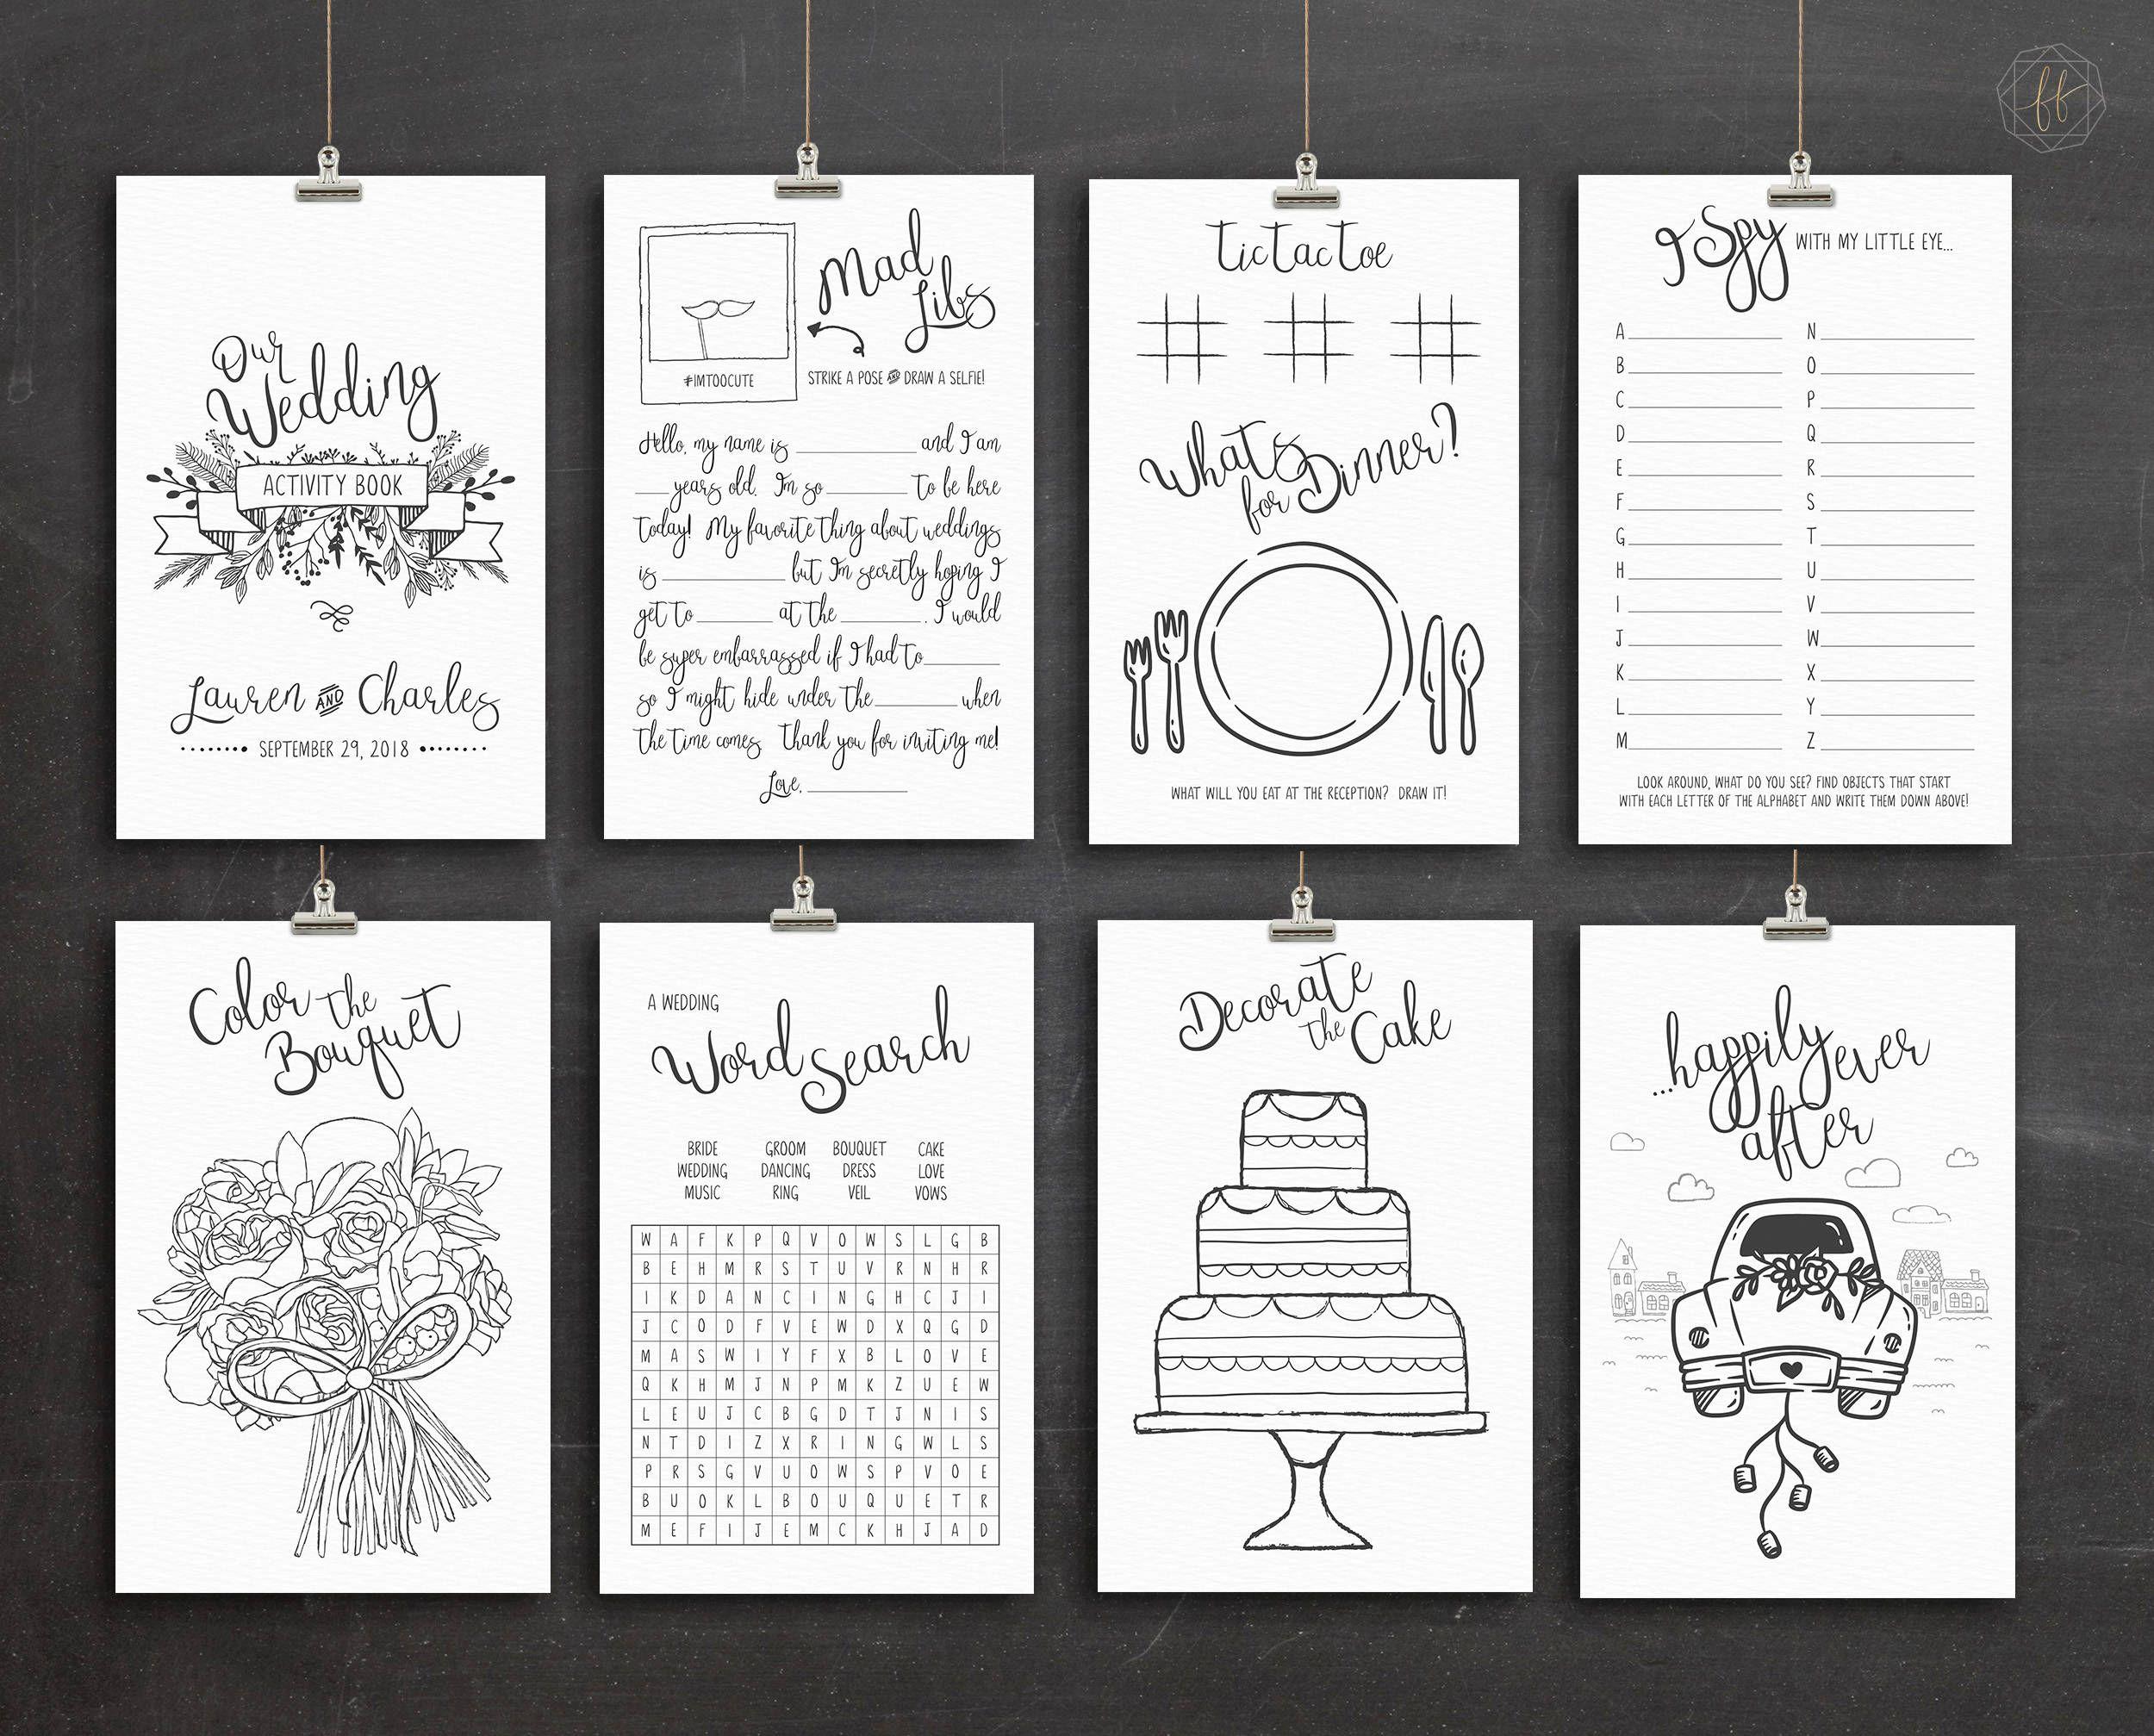 Wedding Coloring Book Wedding Activity Book Kids Wedding Etsy Wedding With Kids Wedding Activities Kids Activity Books